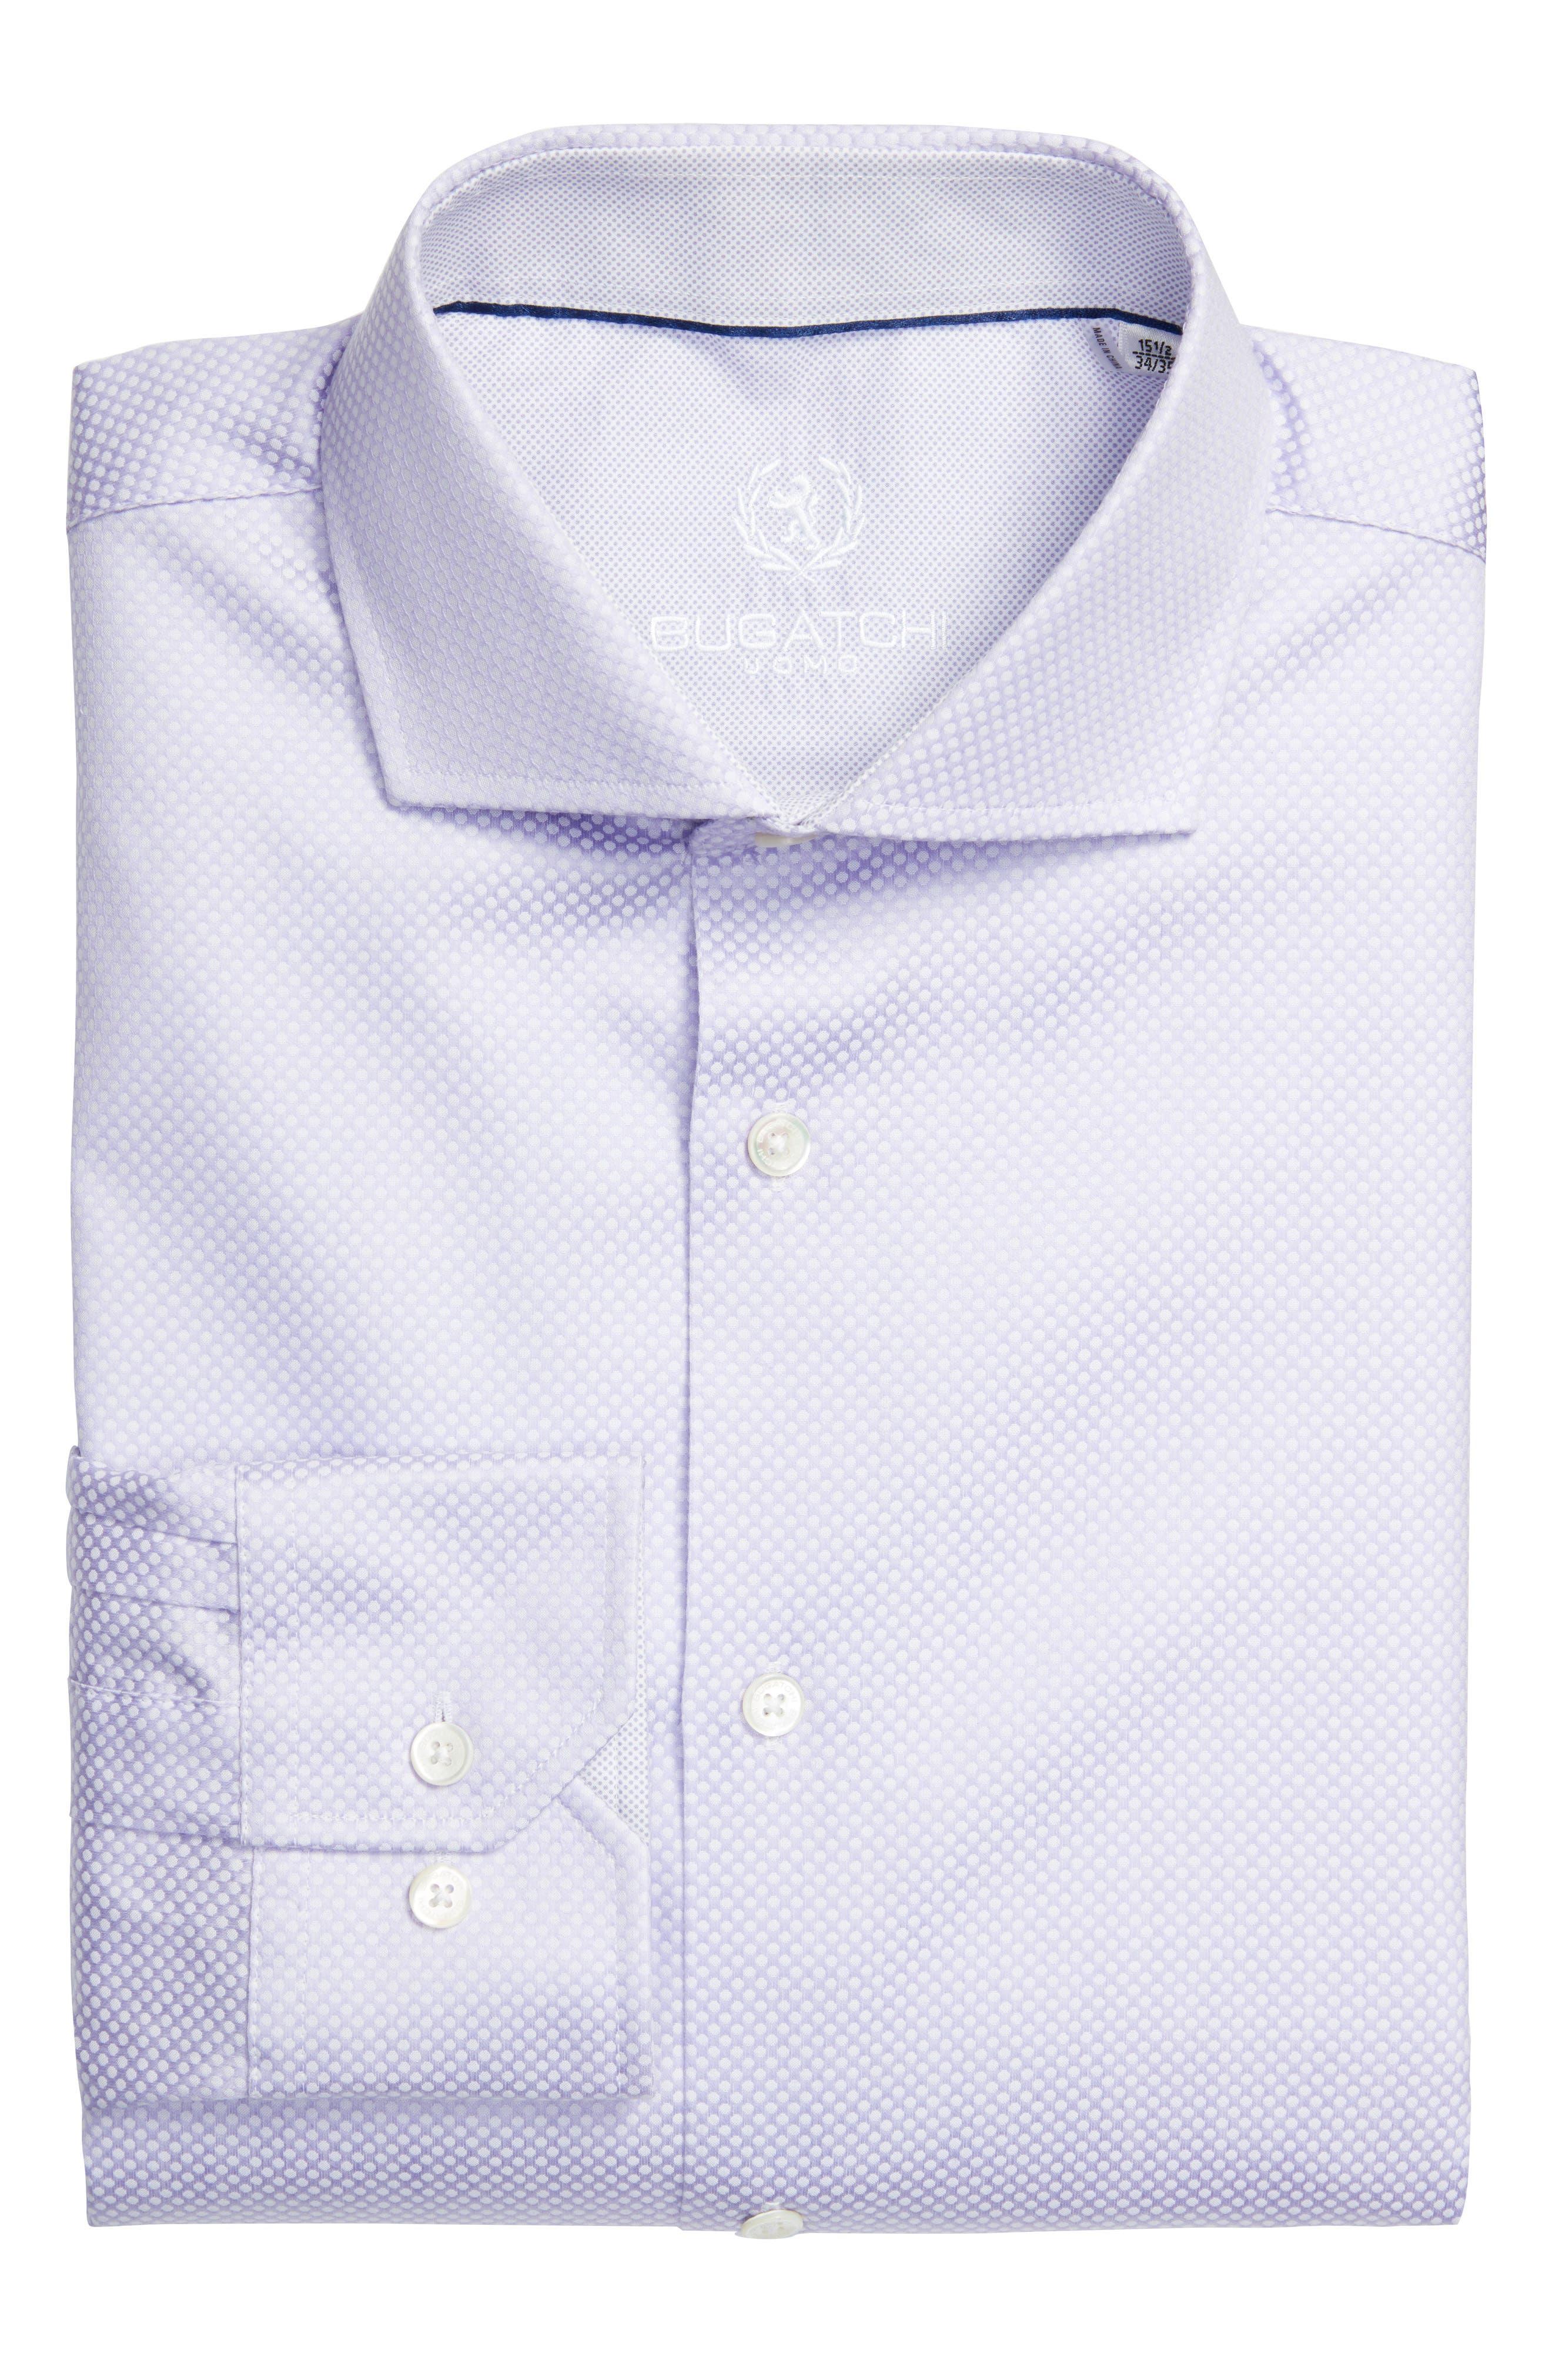 Trim Fit Dot Jacquard Dress Shirt,                         Main,                         color, 531